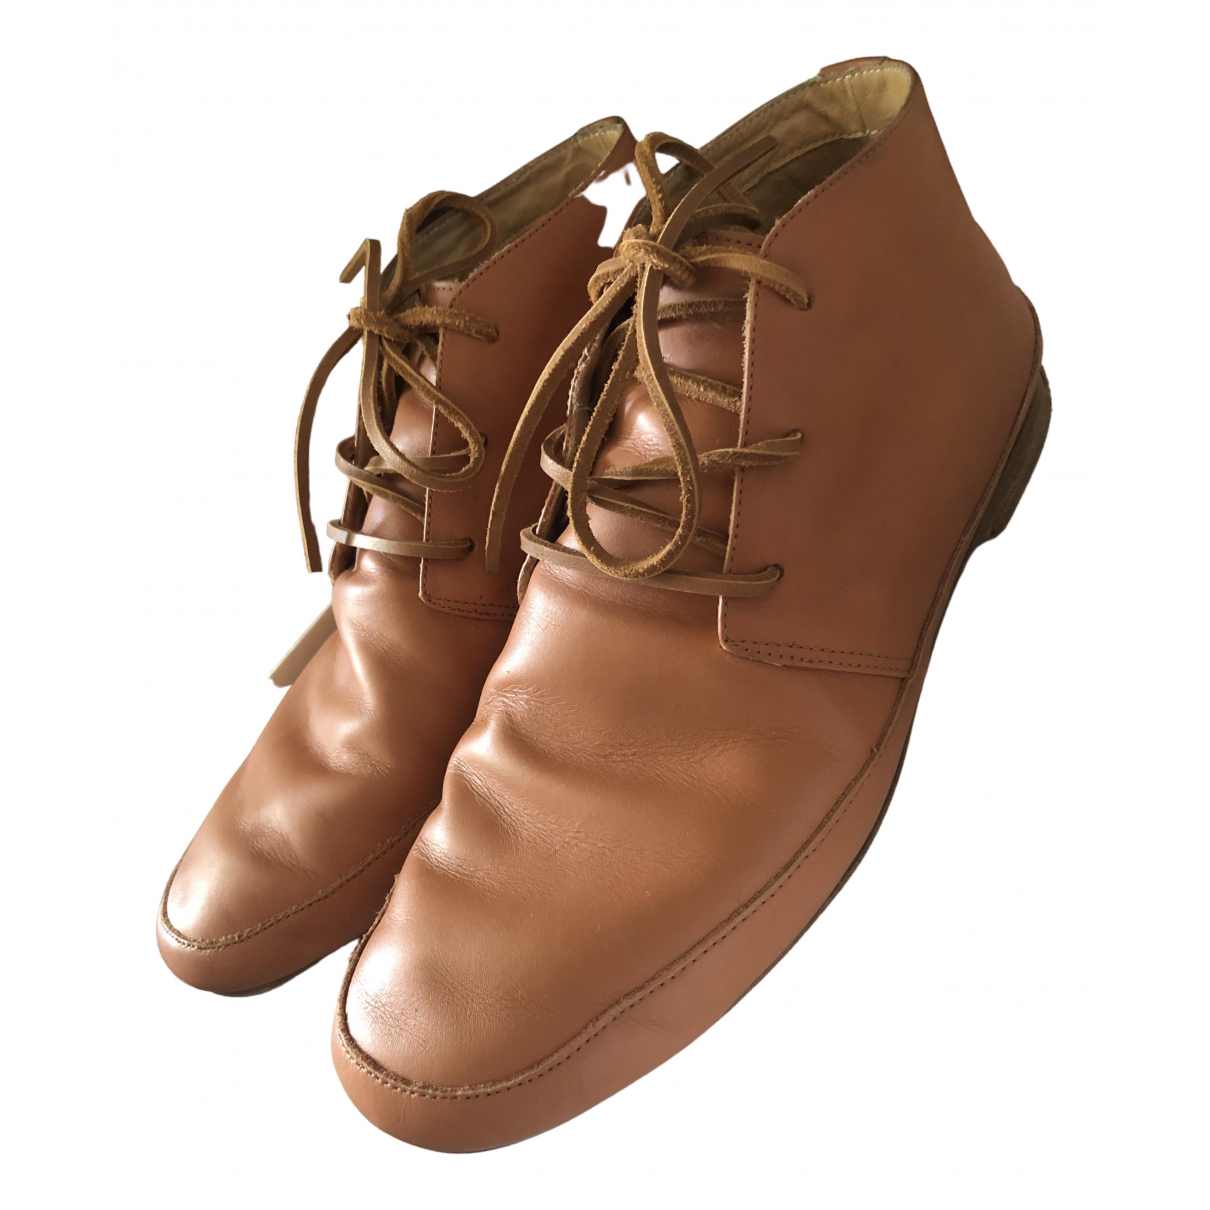 Maison Martin Margiela \N Camel Leather Boots for Men 42 EU